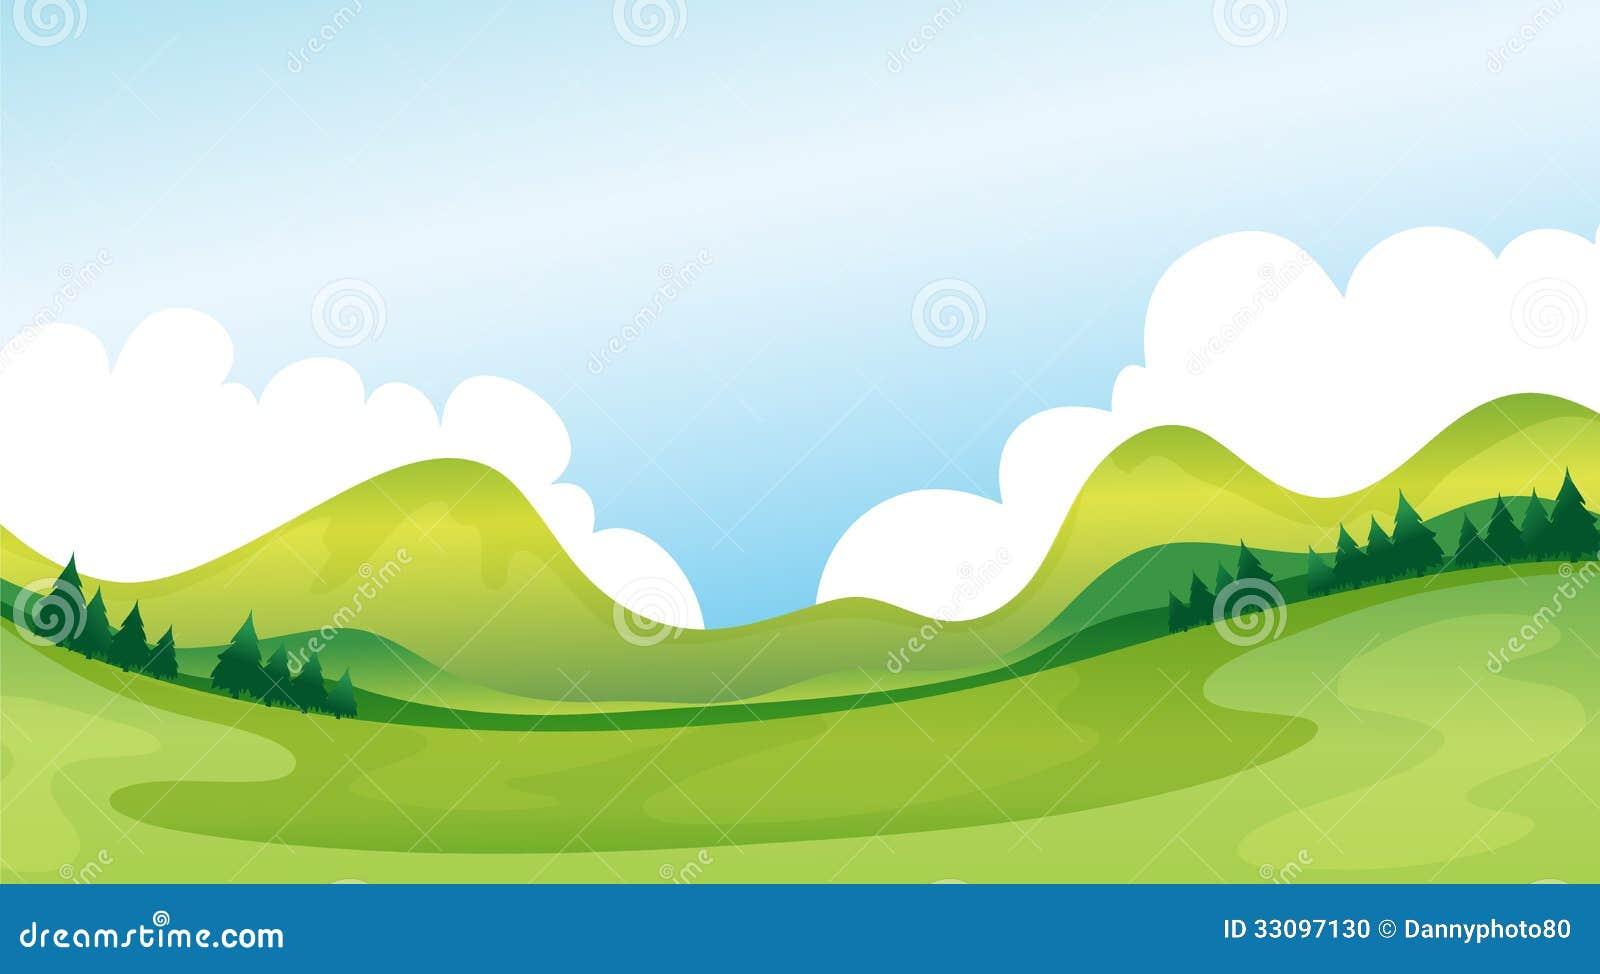 Landscape Illustration Vector Free: A Green Landscape Stock Vector. Illustration Of